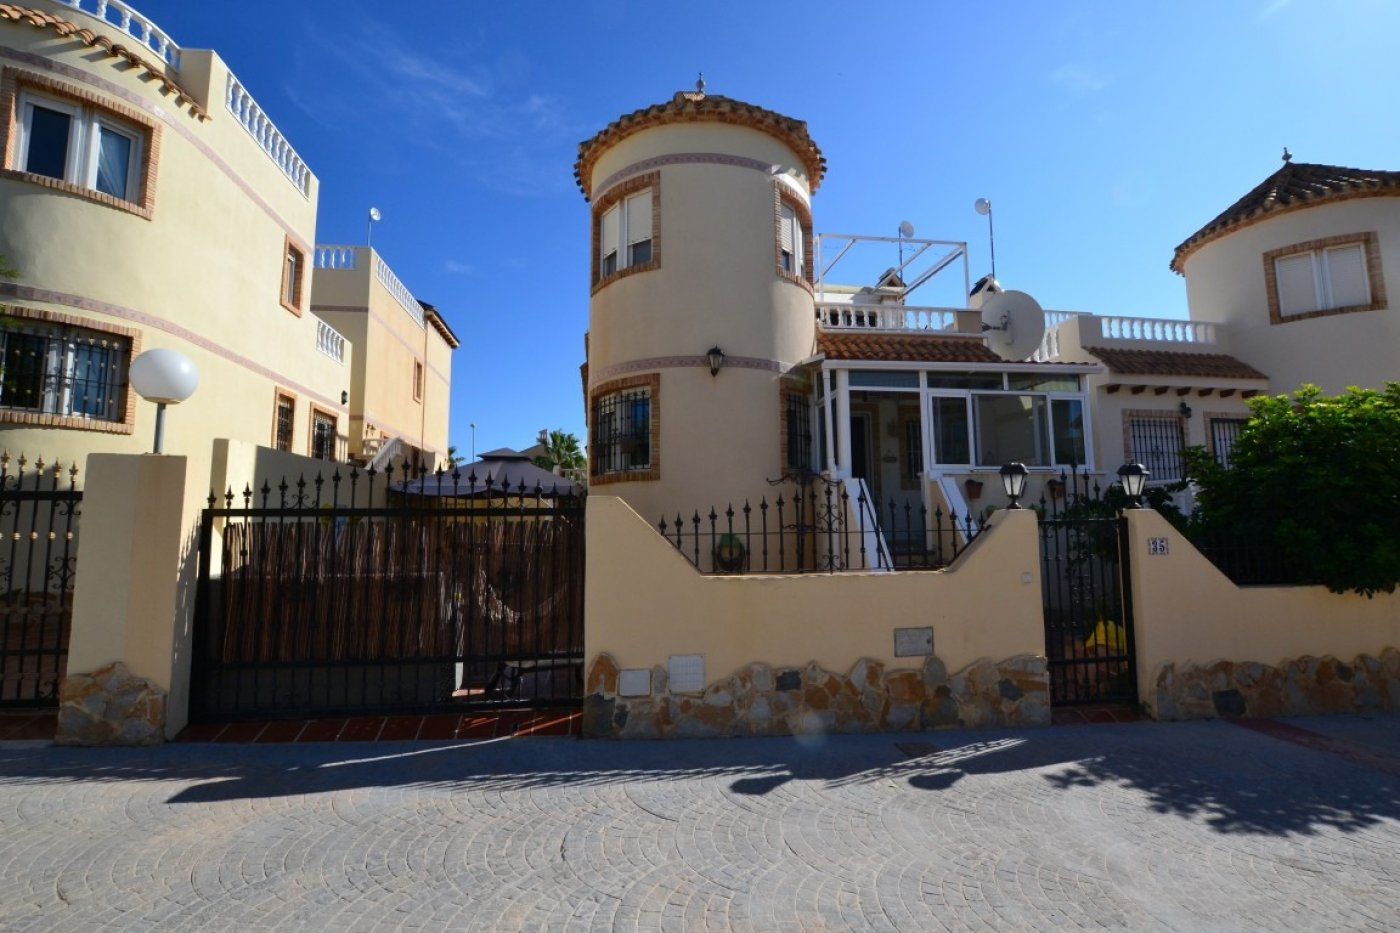 Semi Detached - Bestaande bouw - Orihuela Costa - Playa Flamenca